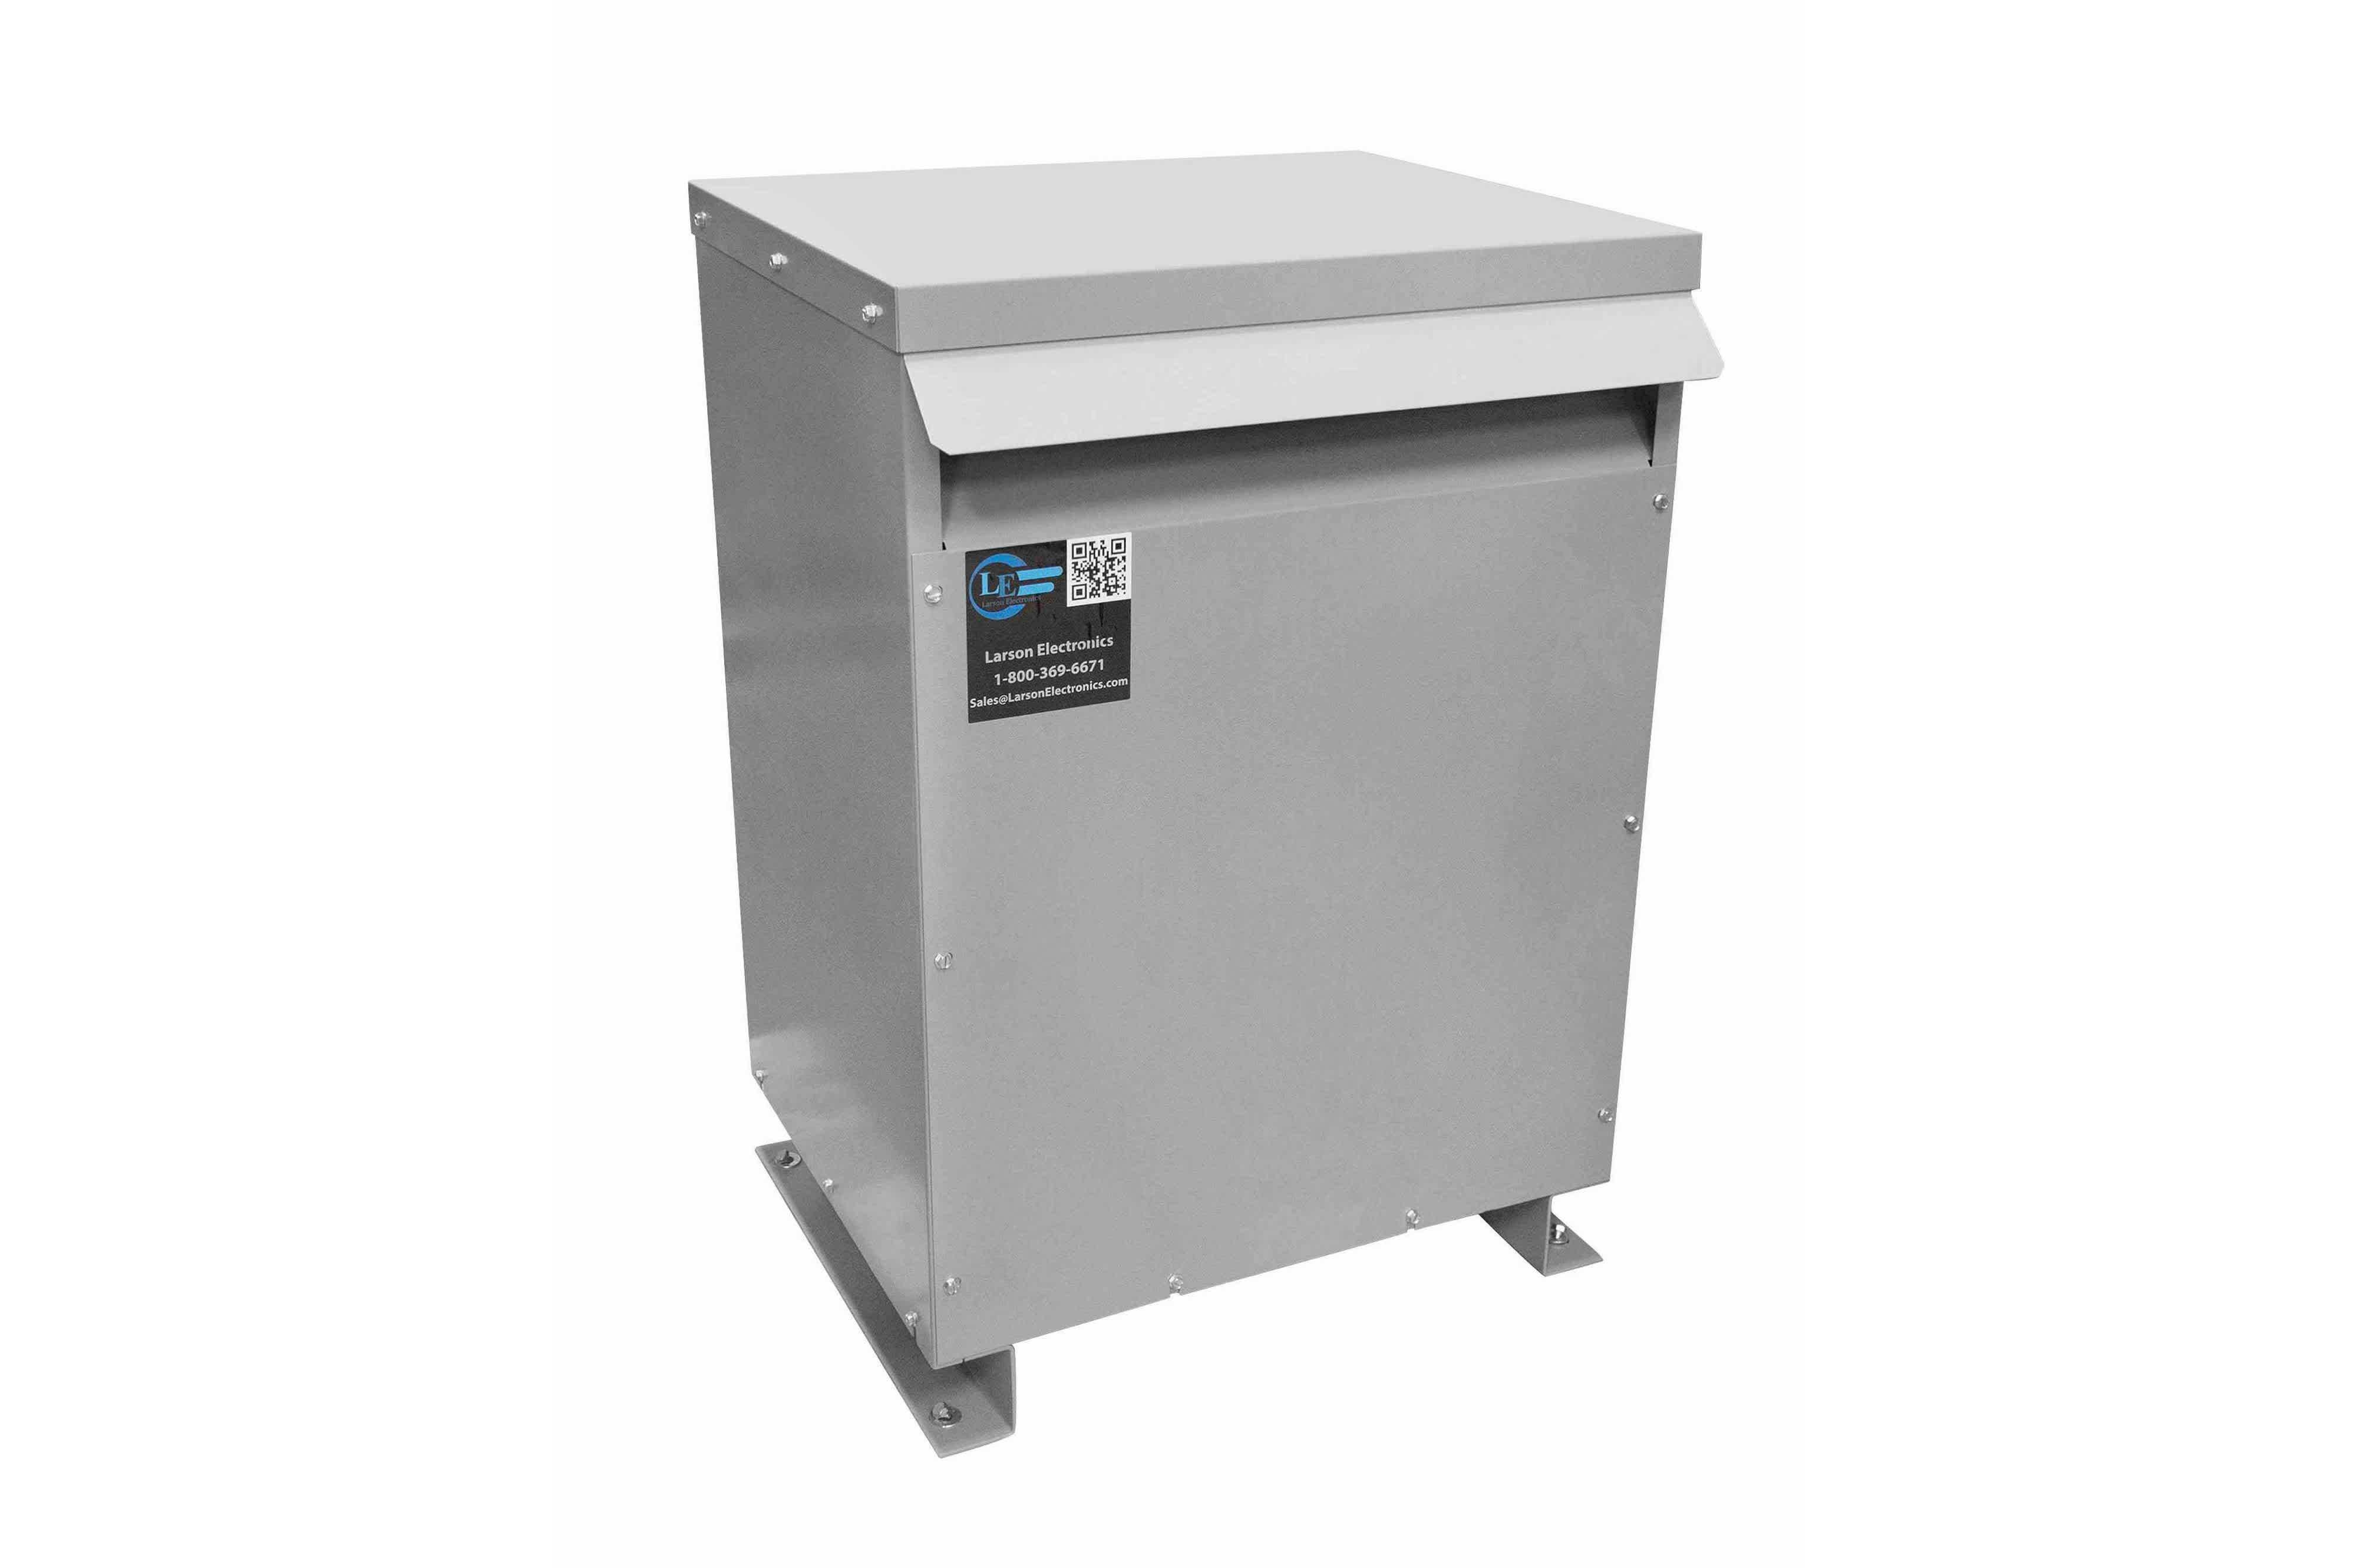 250 kVA 3PH Isolation Transformer, 575V Wye Primary, 480Y/277 Wye-N Secondary, N3R, Ventilated, 60 Hz